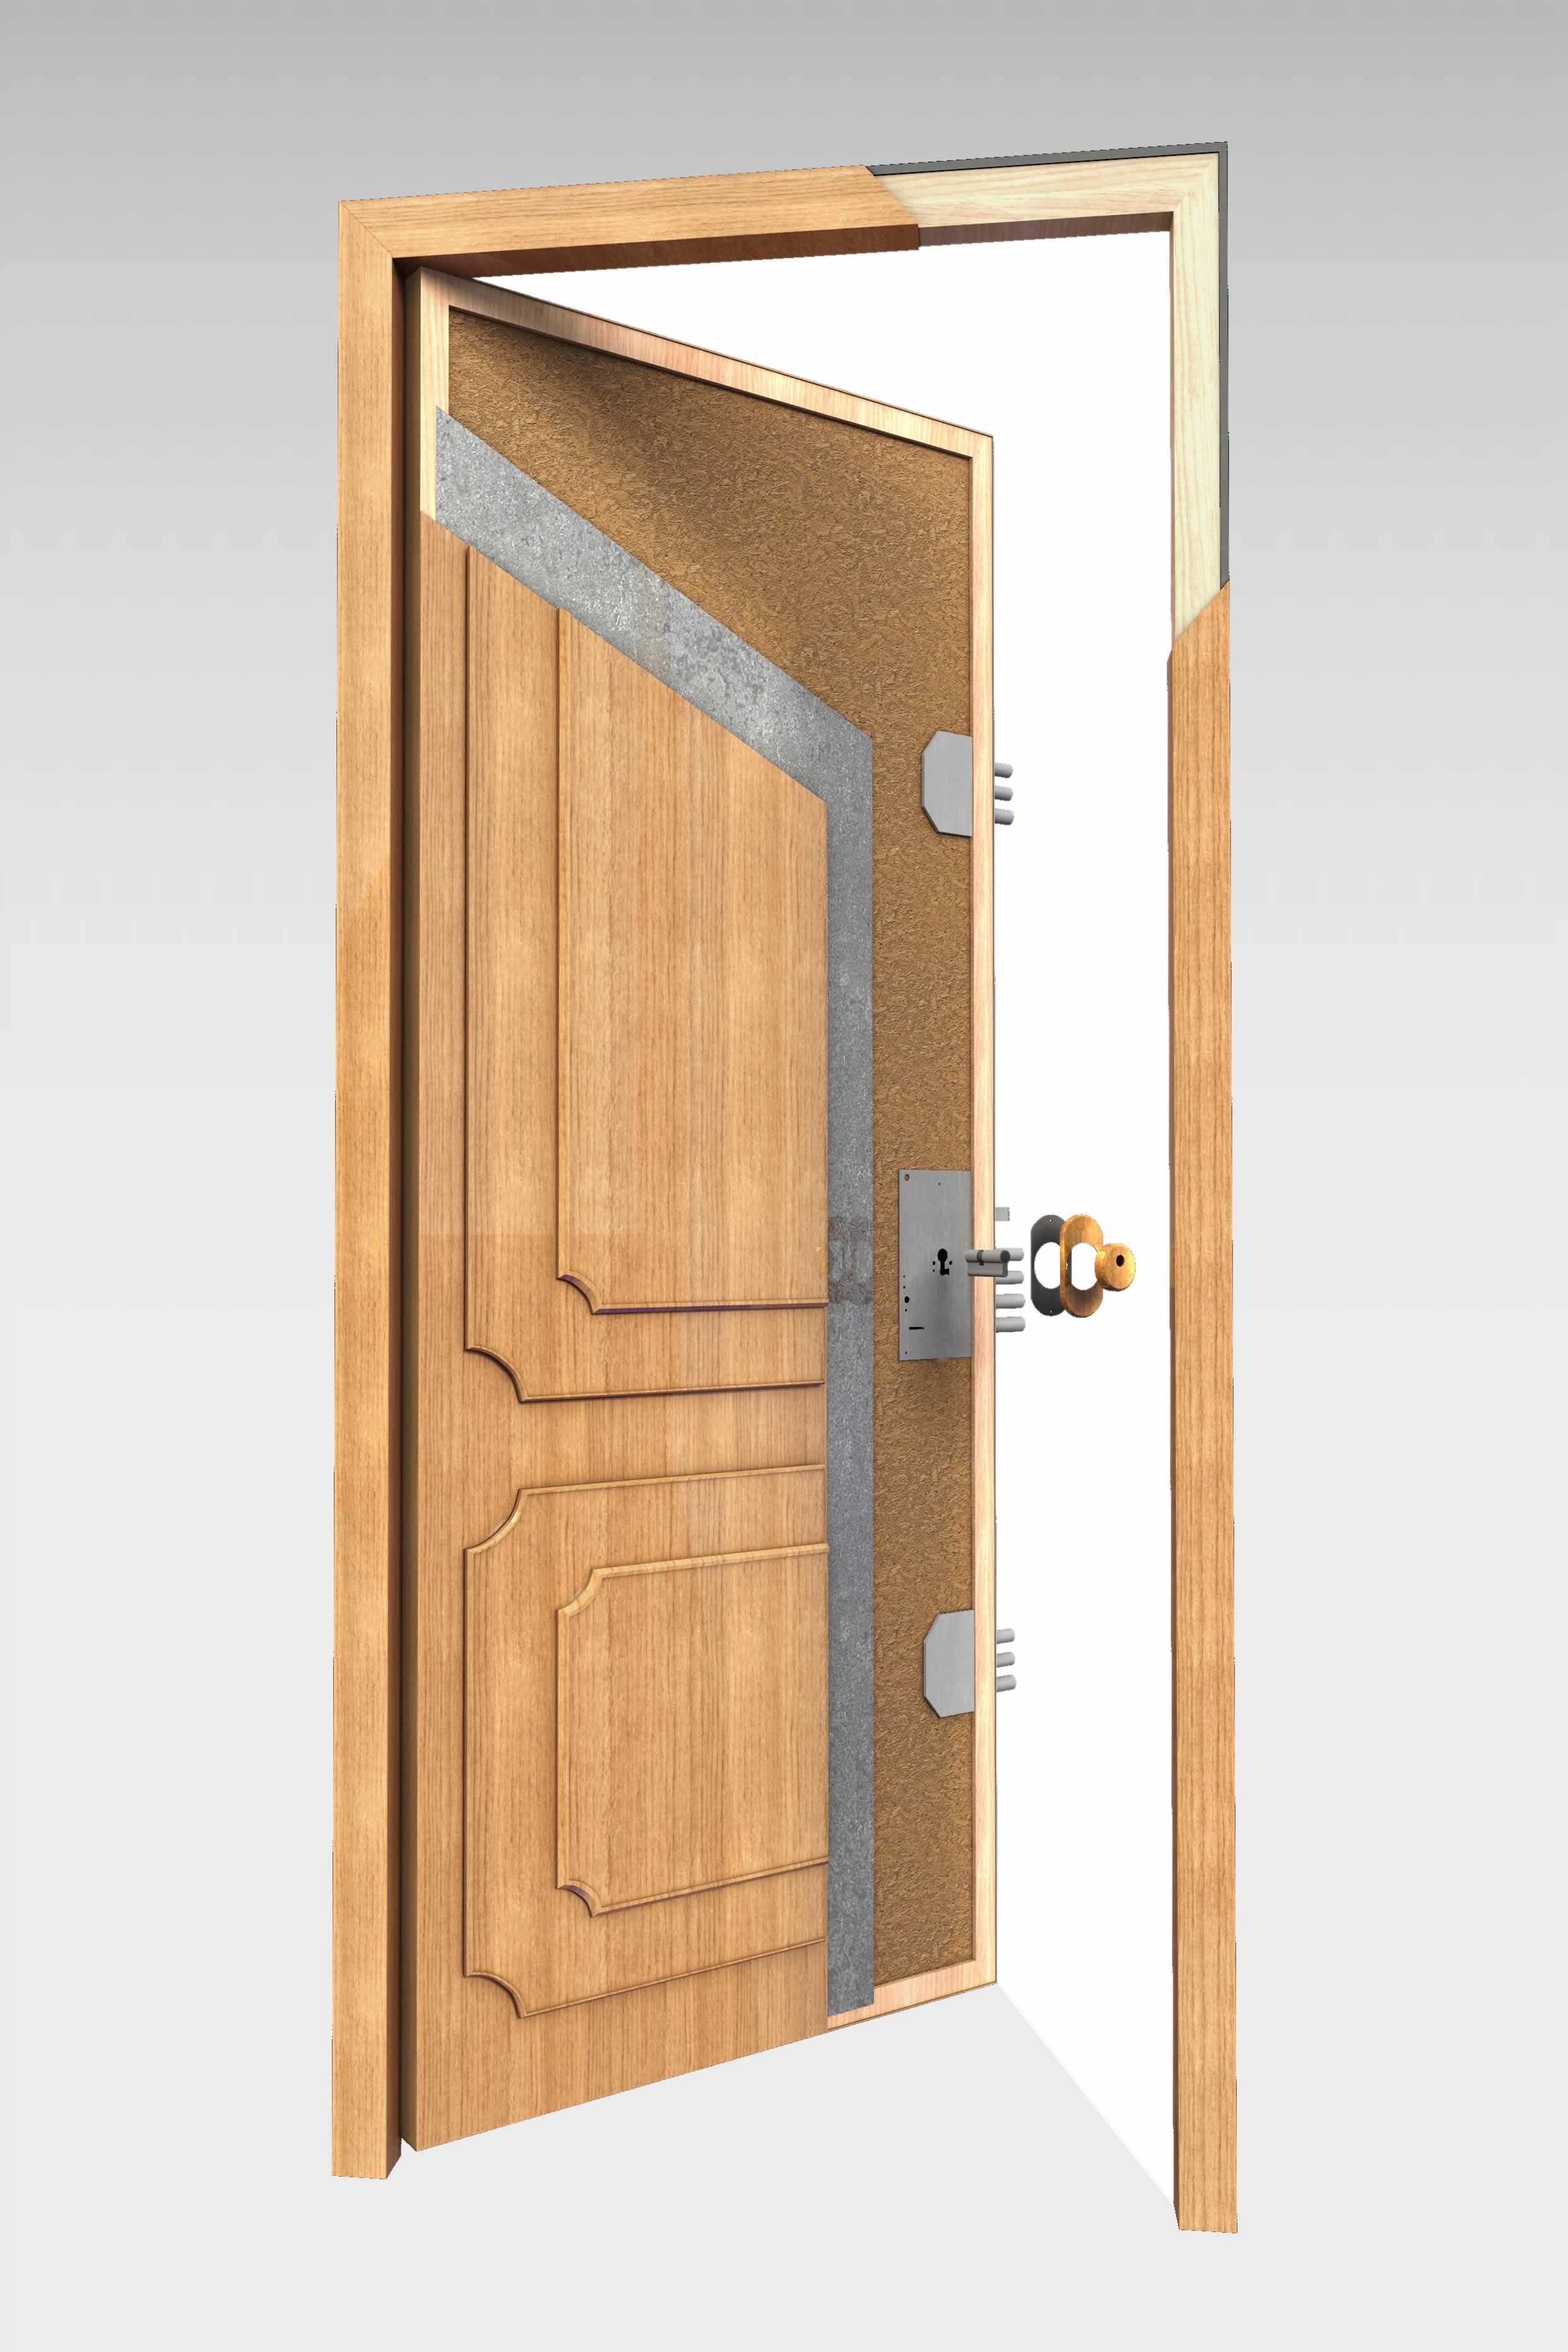 Puertas baratas best puertas baratas ventanas baratas for Puertas blindadas baratas